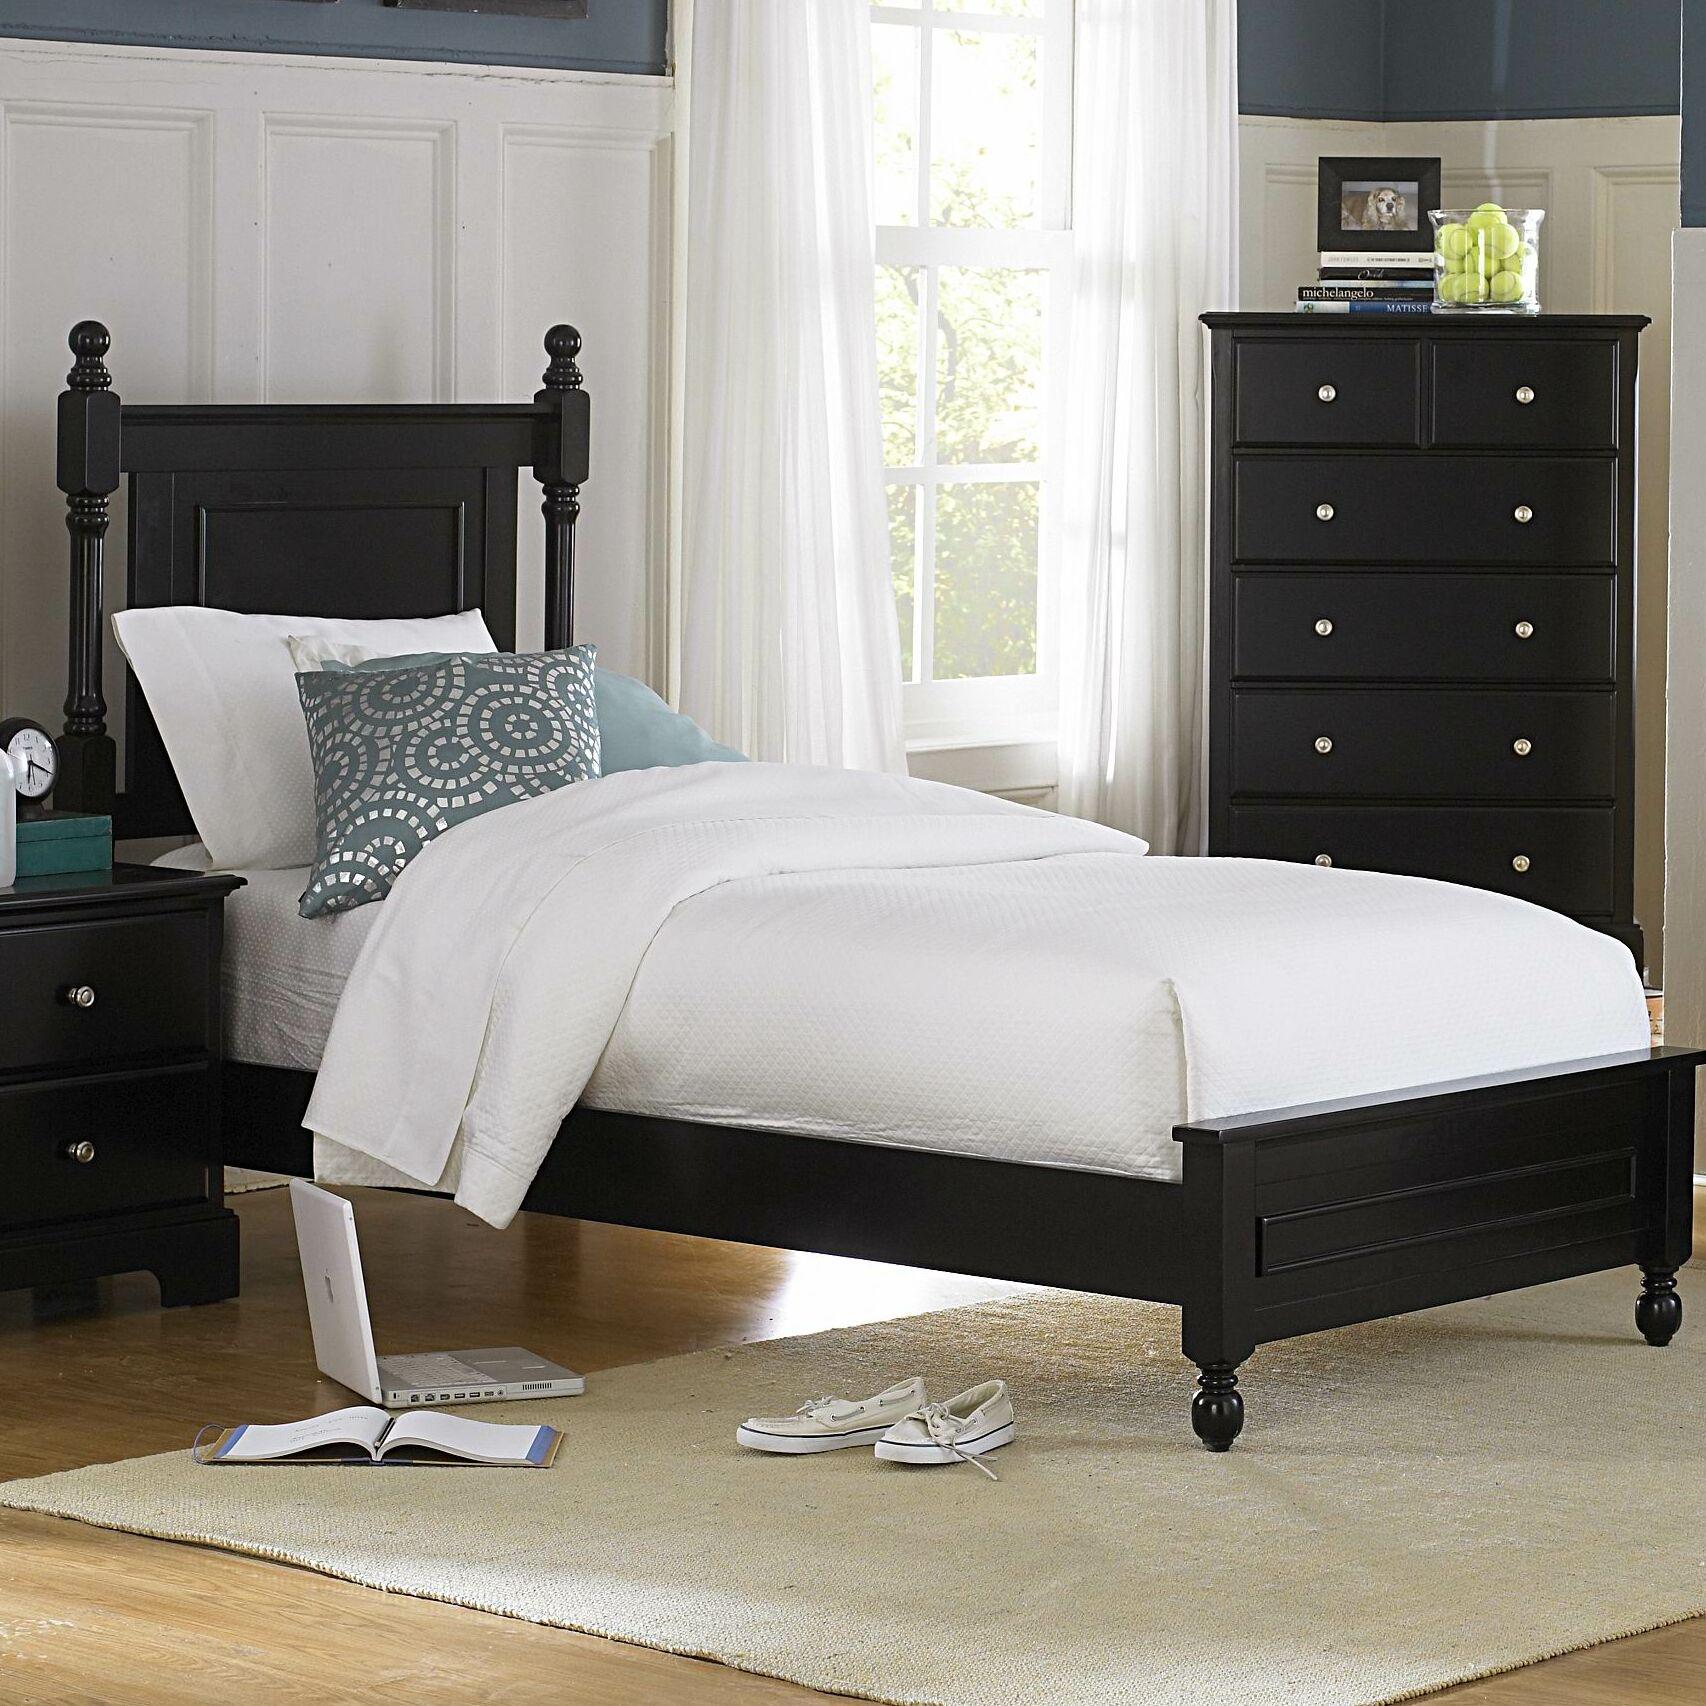 Rotonda Panel Bed Color: Black, Size: King